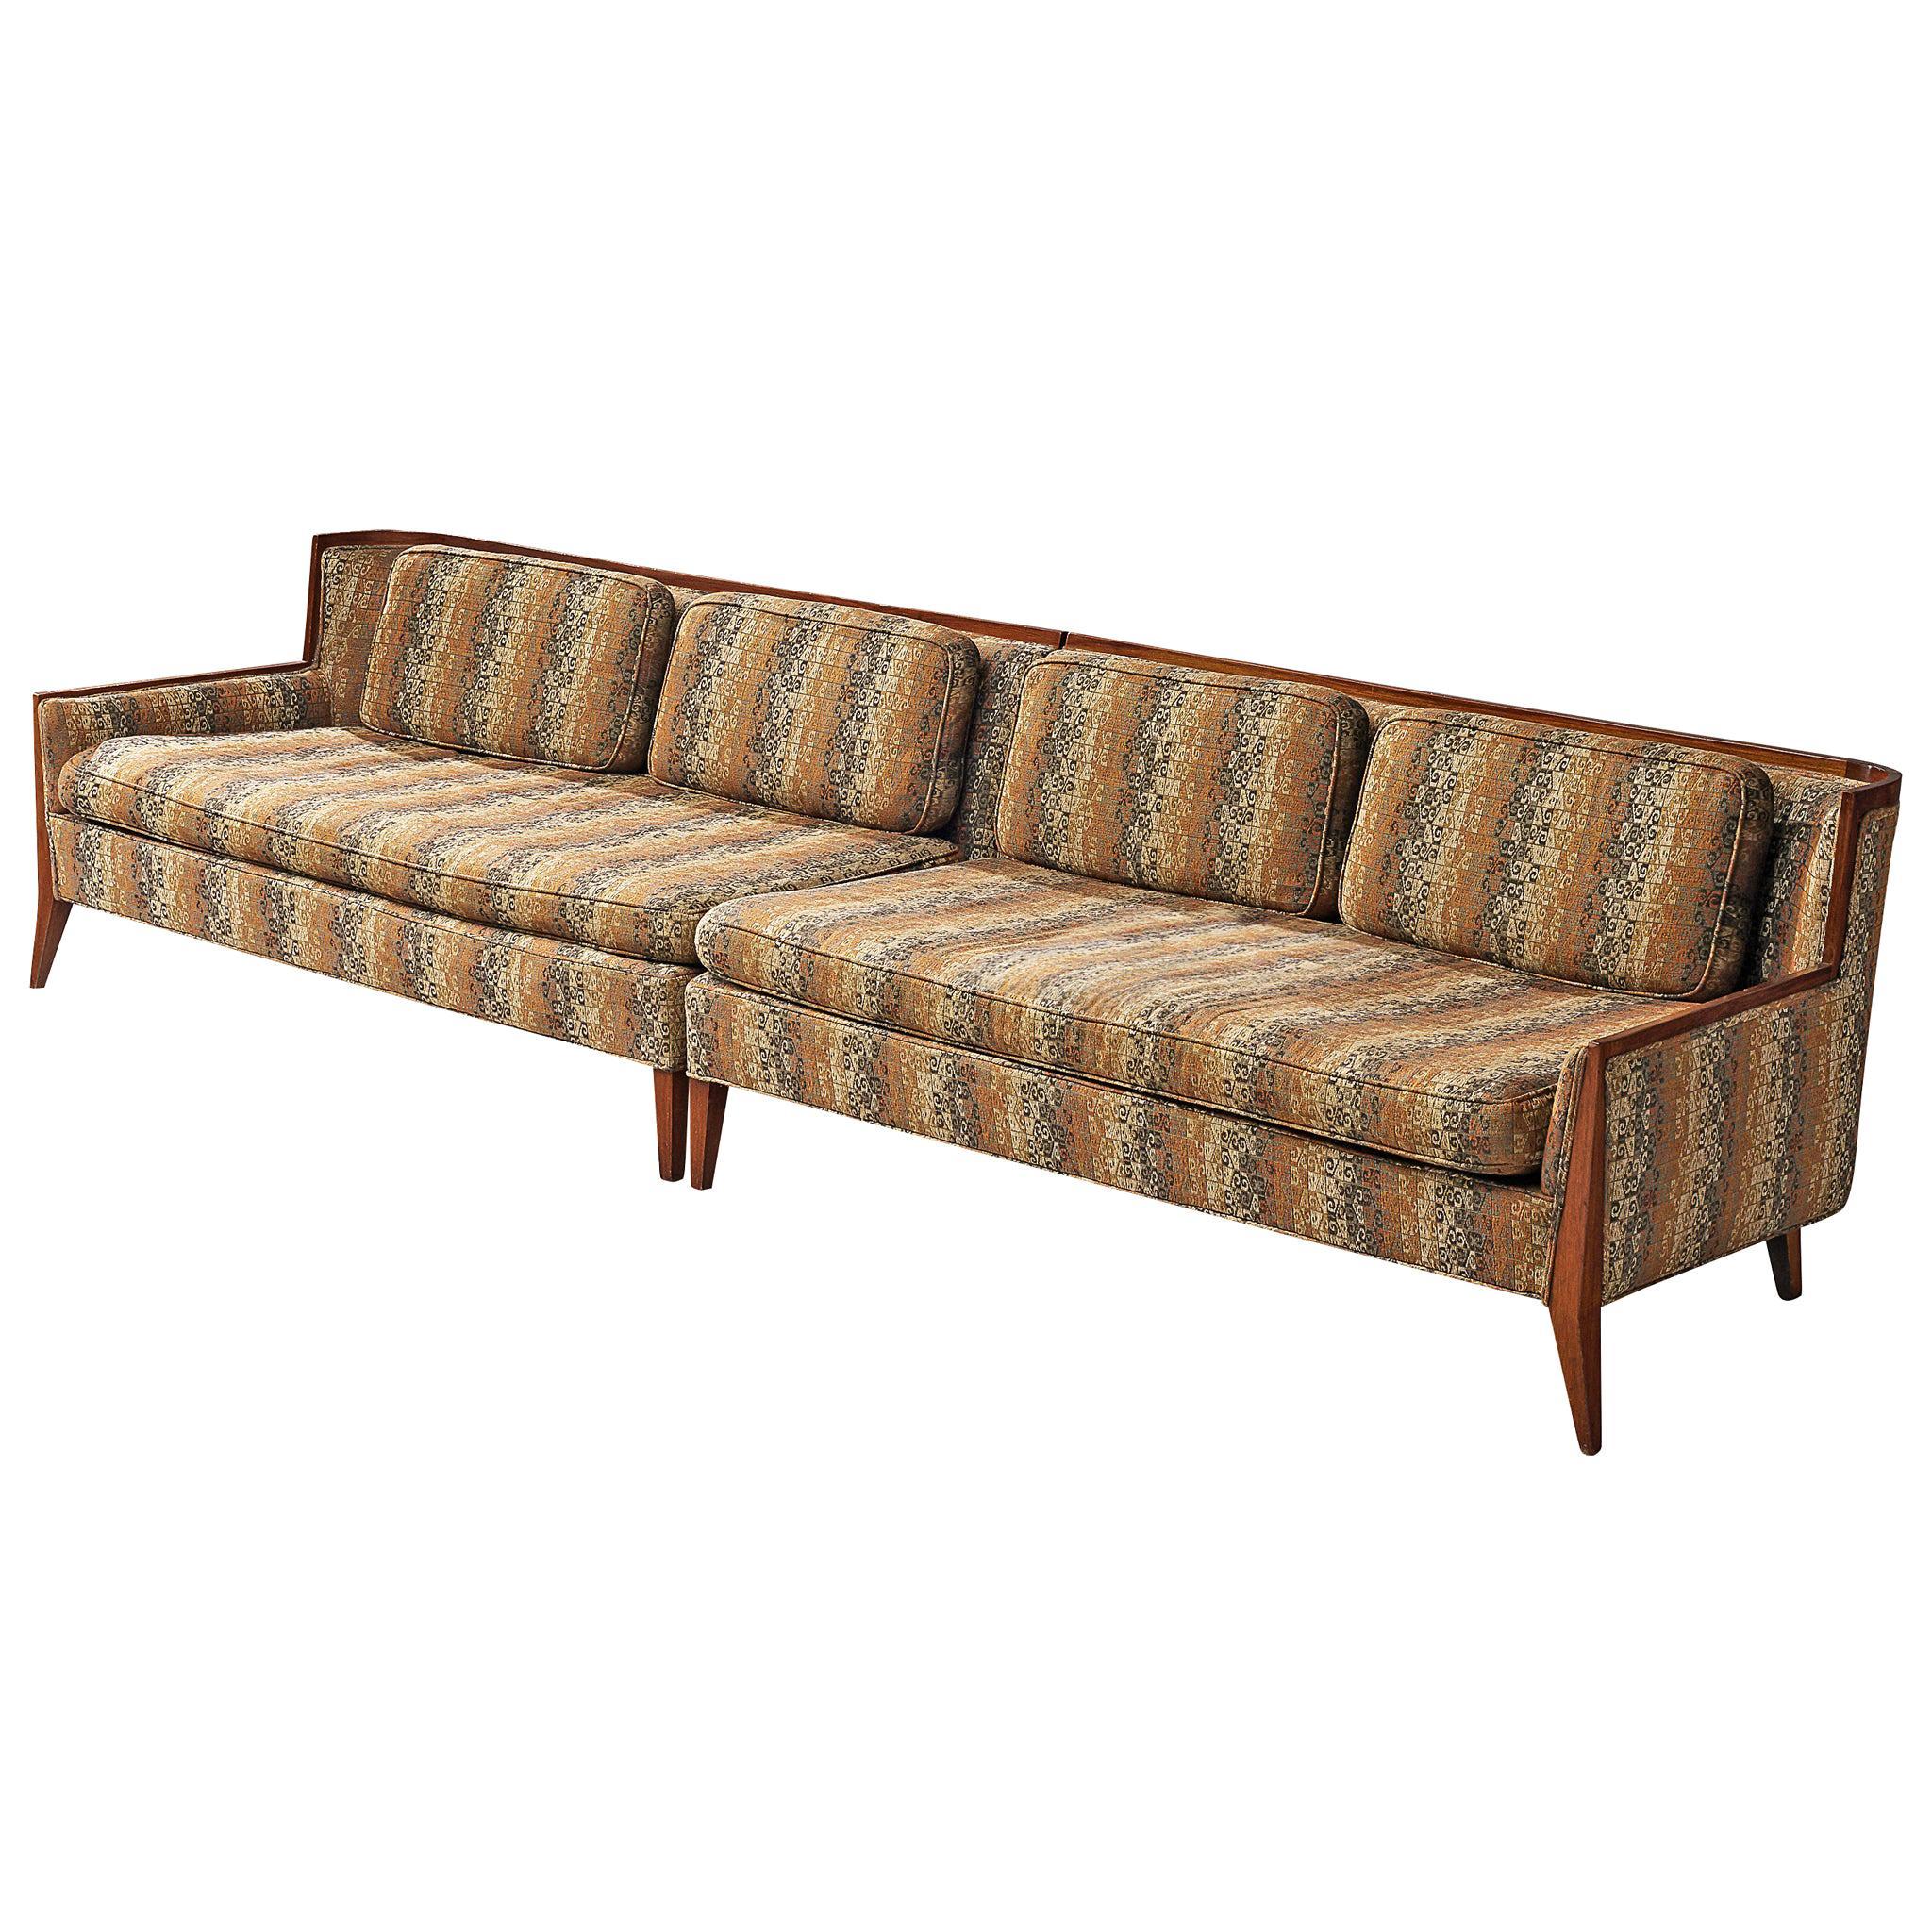 Paul McCobb for Directional Sofa